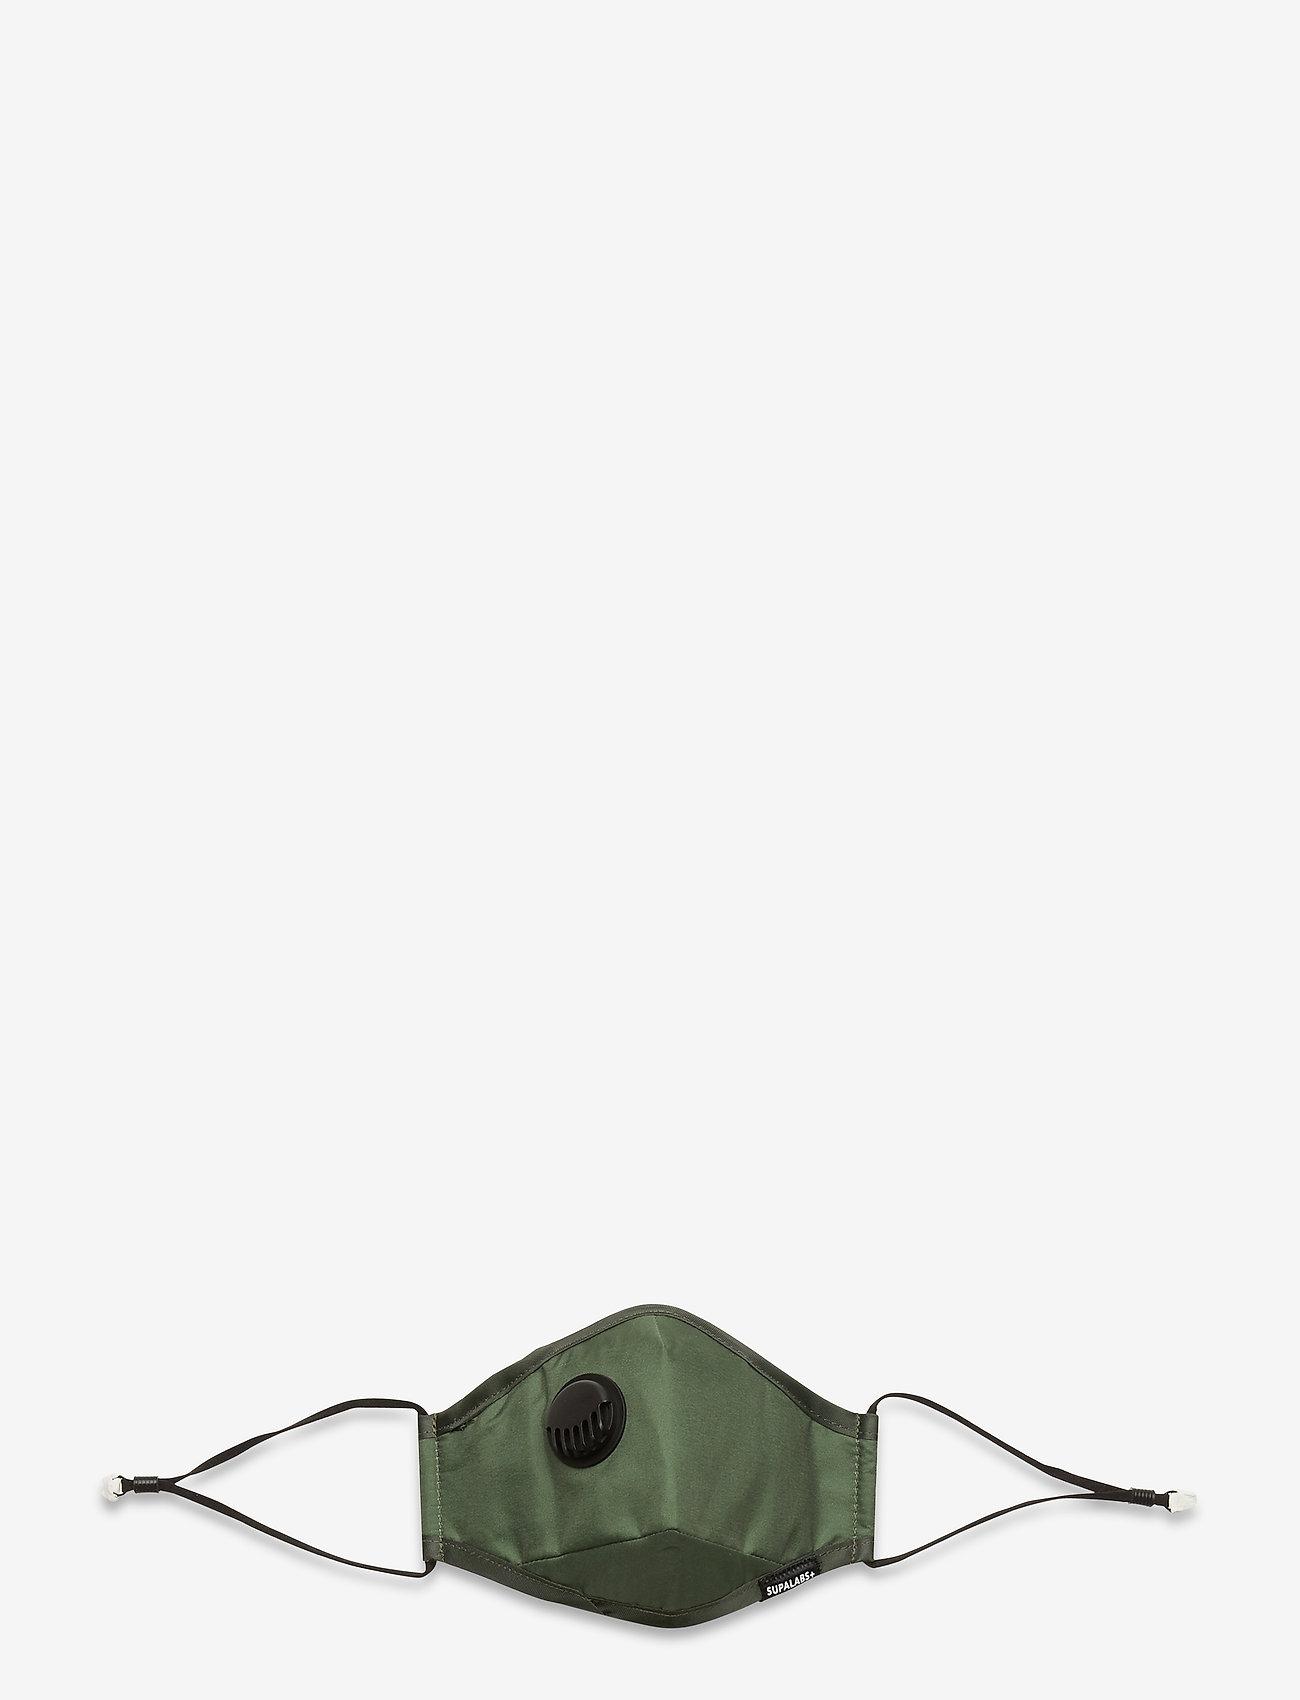 SUPALABS - LI ADULT HERO MASK ARMY GREEN - ansiktsmasker - army green - 1